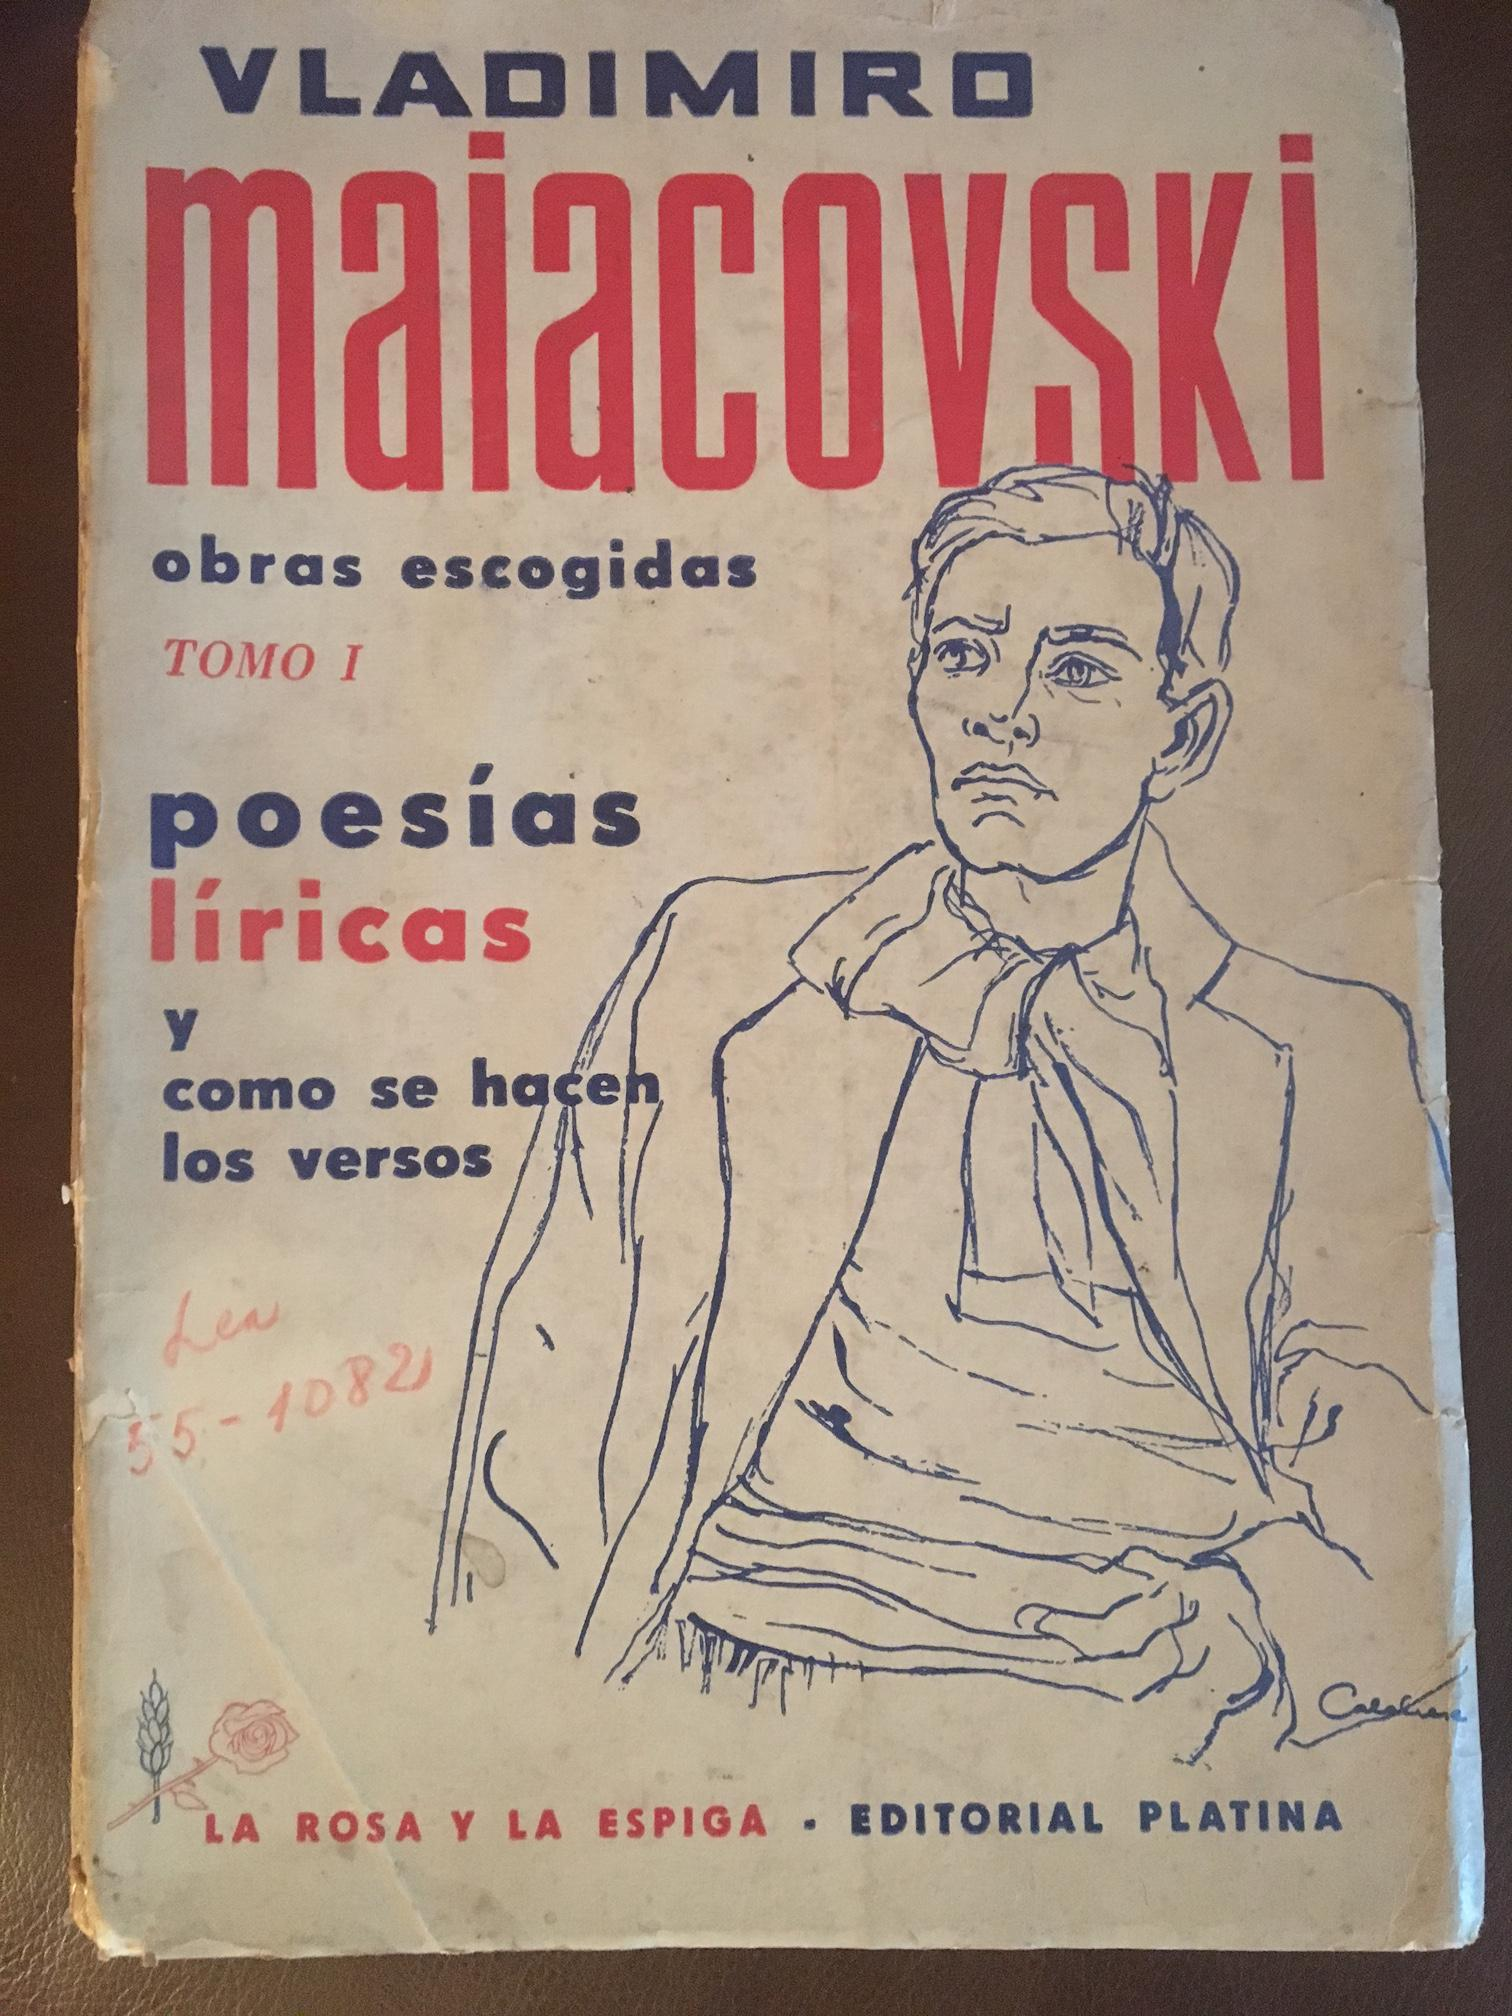 Collecting Vladimir Mayakovsky in Translation